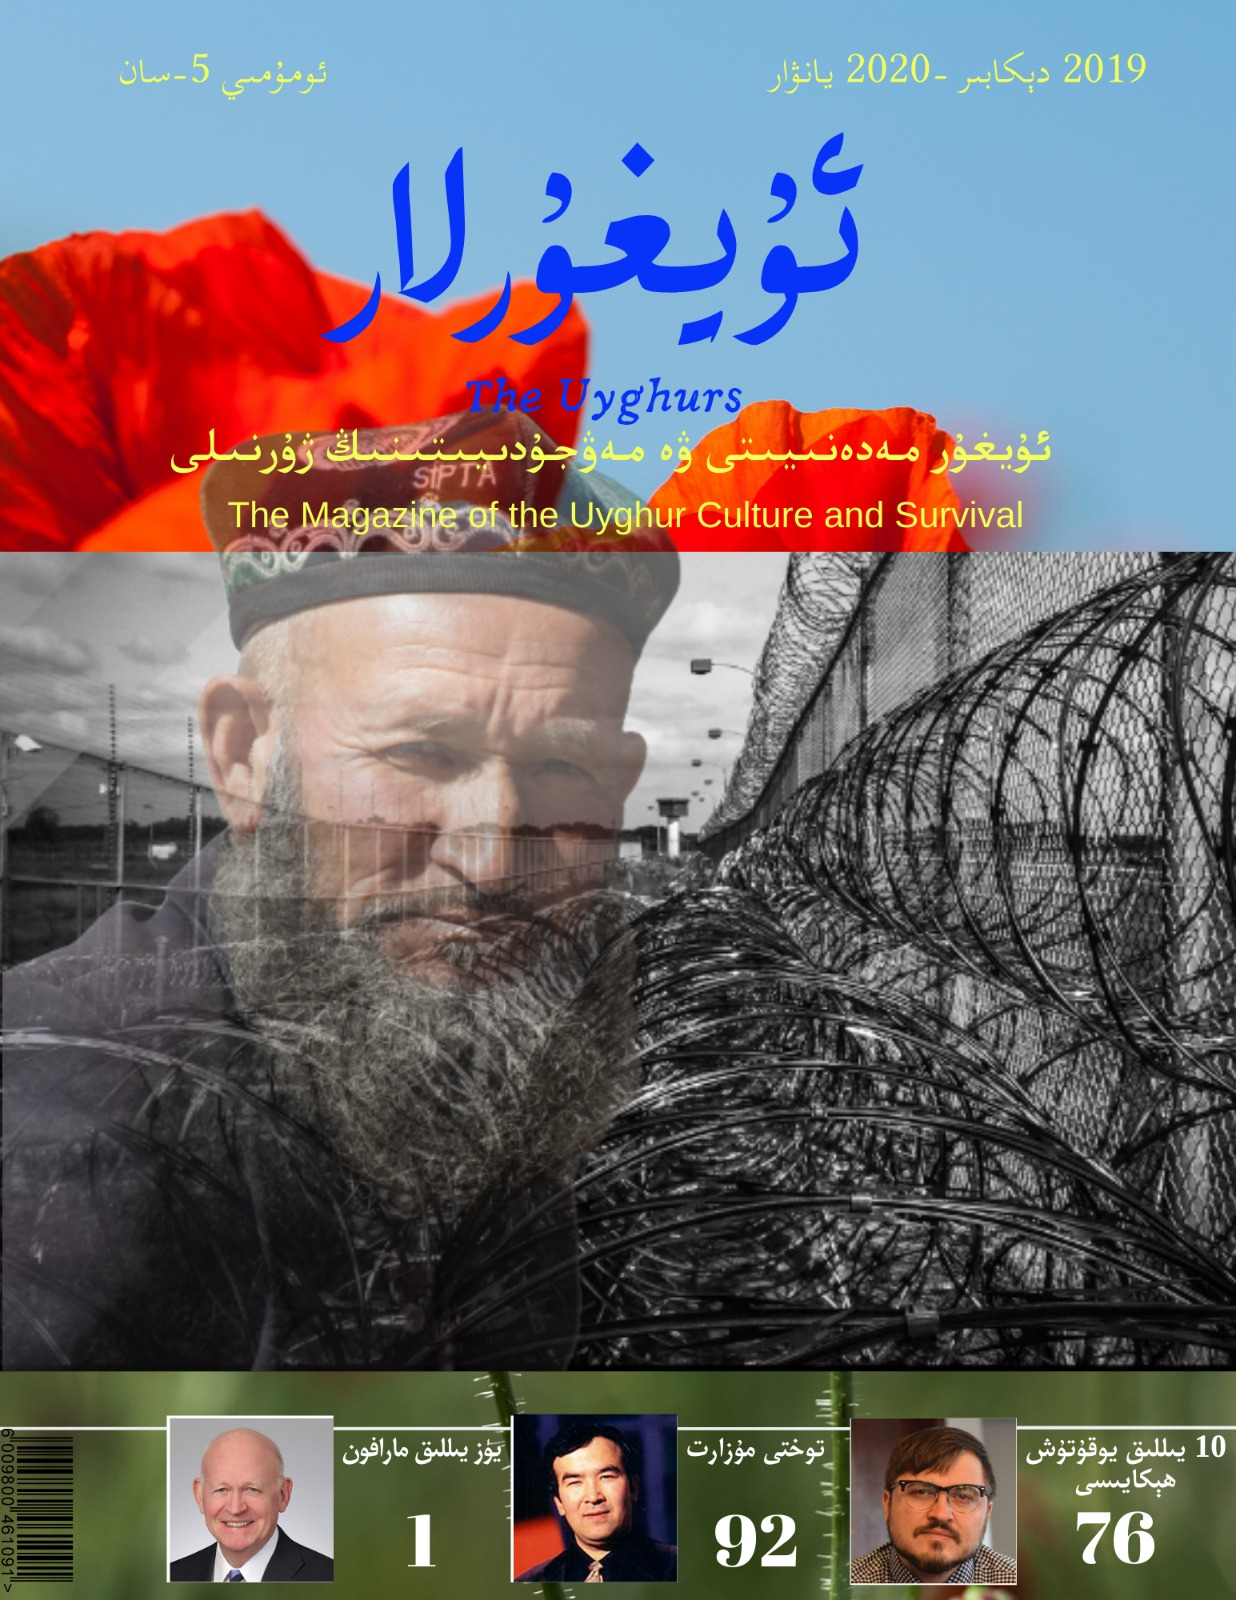 uyghur5 - ئۇيغۇرلار 2019-يىلى 5-سان